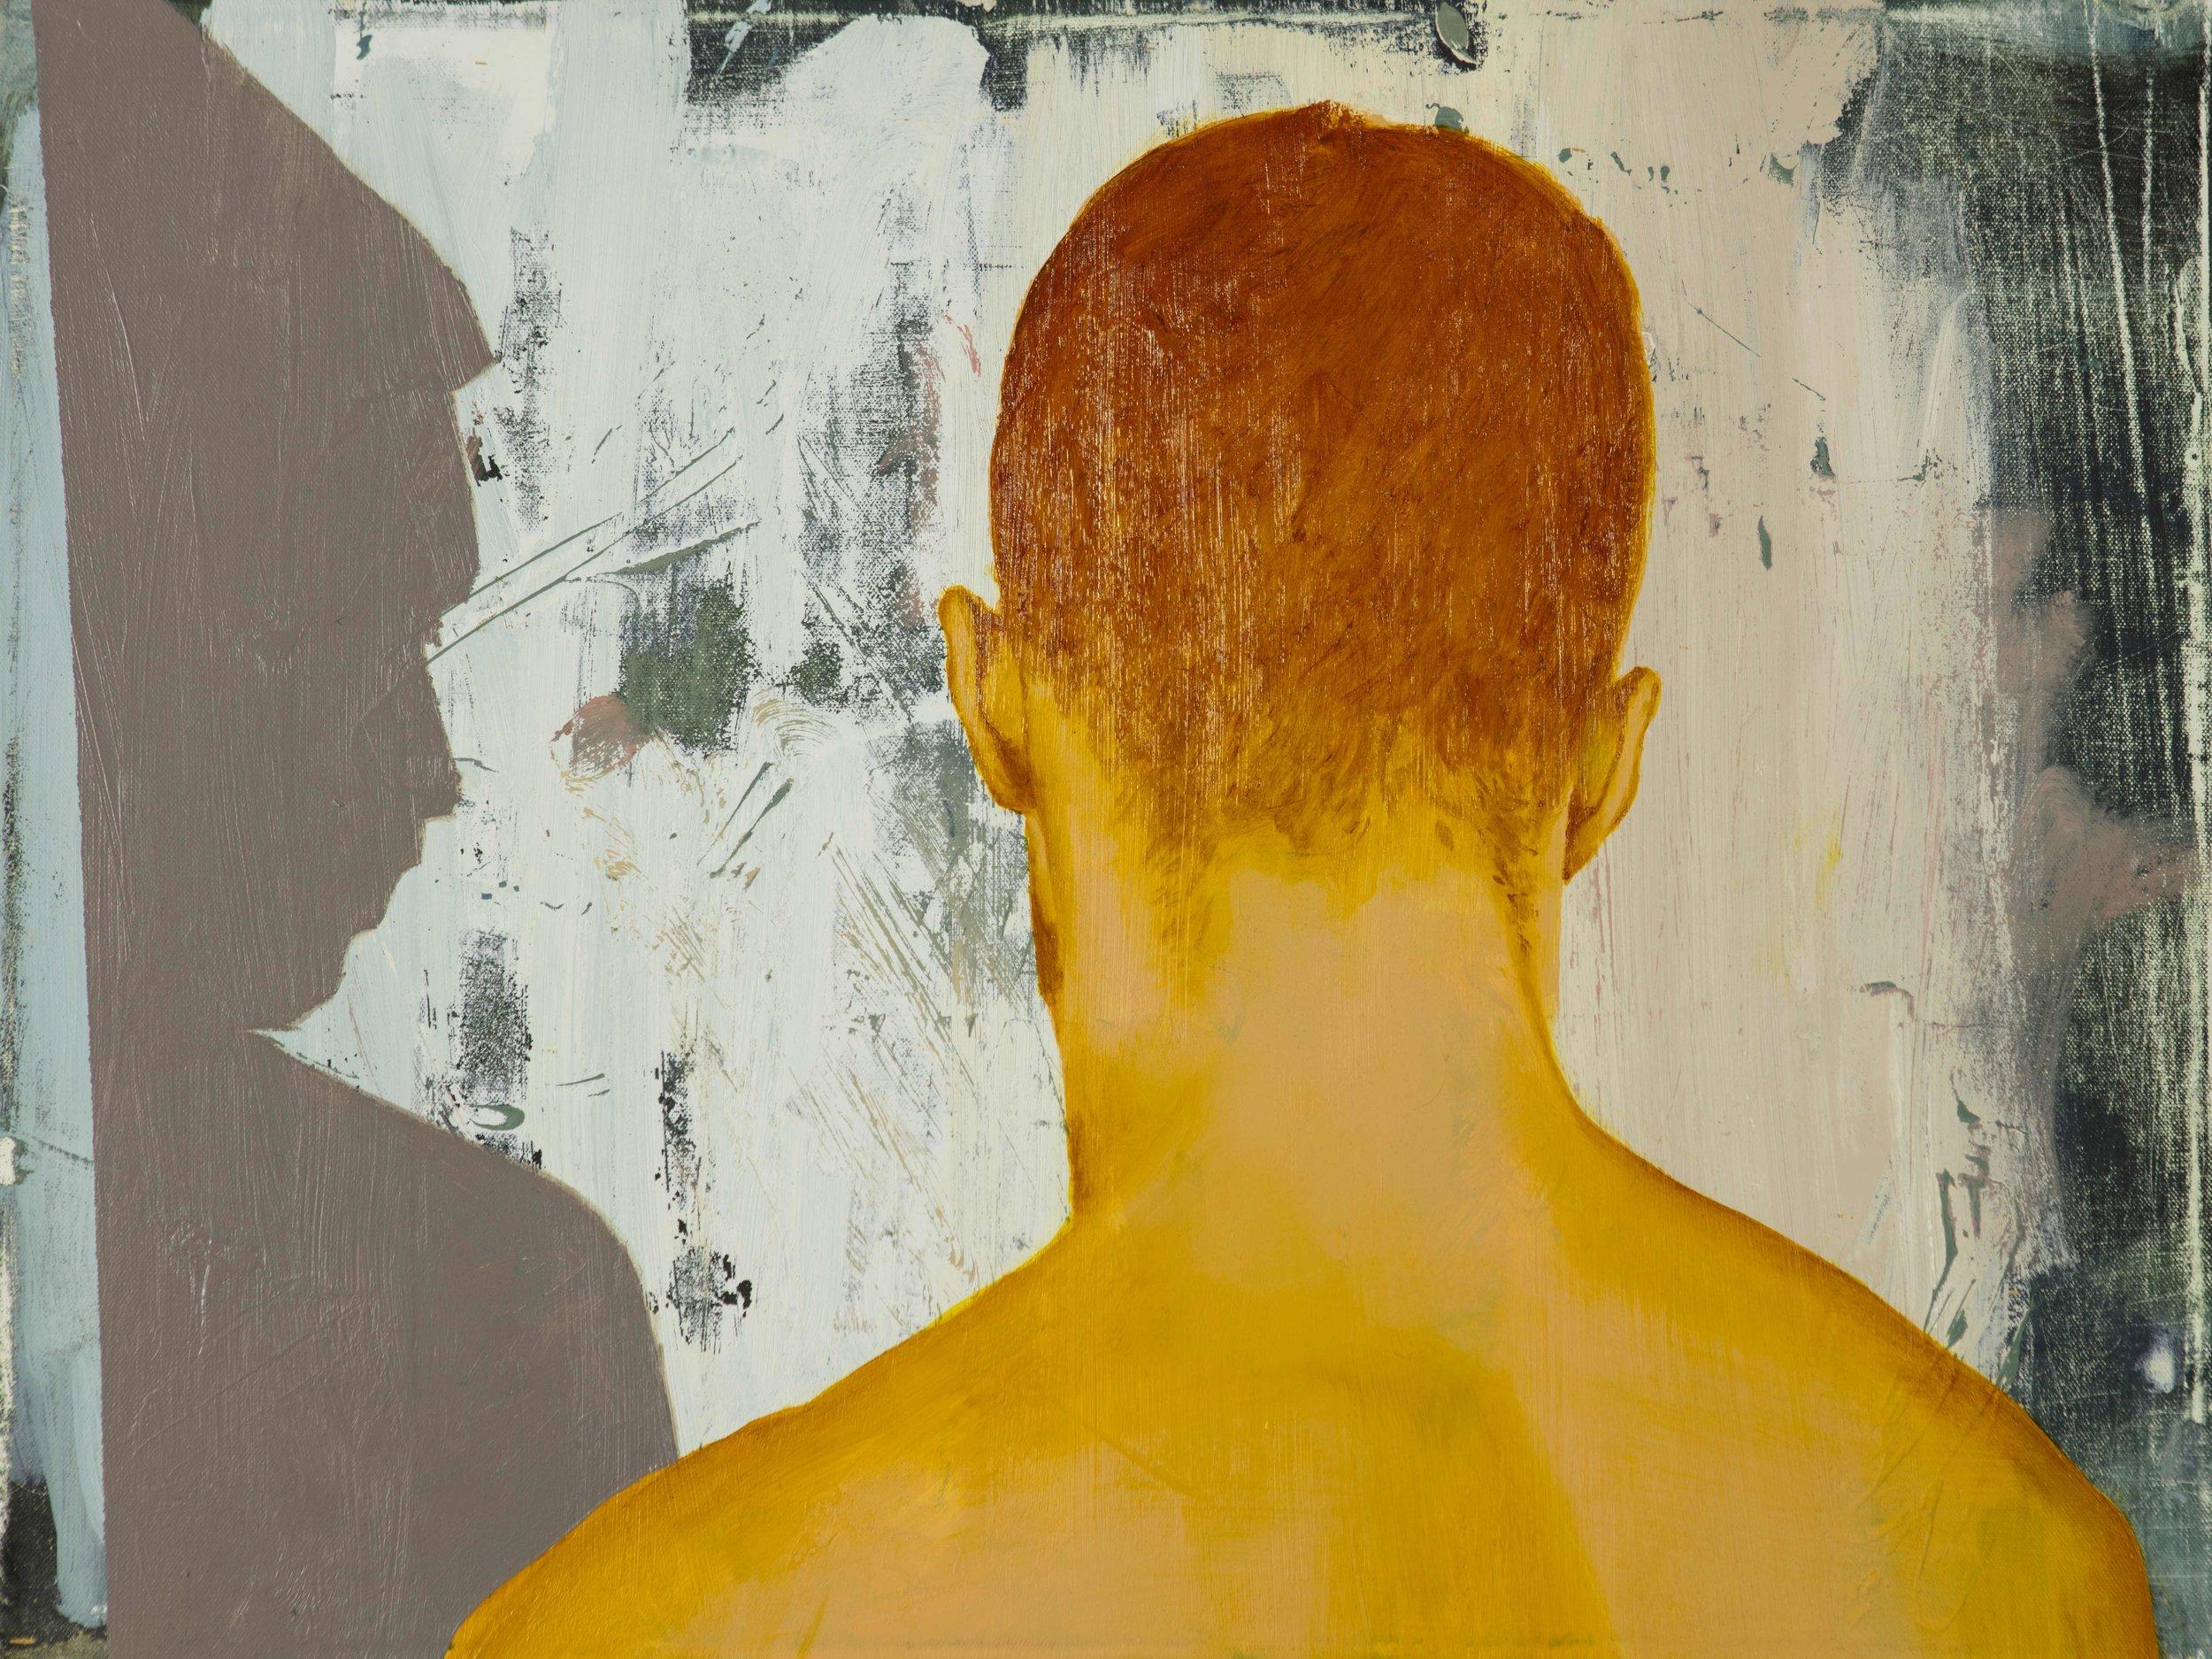 "Shame, Oil on Canvas, 18"" x 24"" ( 46cm x 70cm ) 2018"